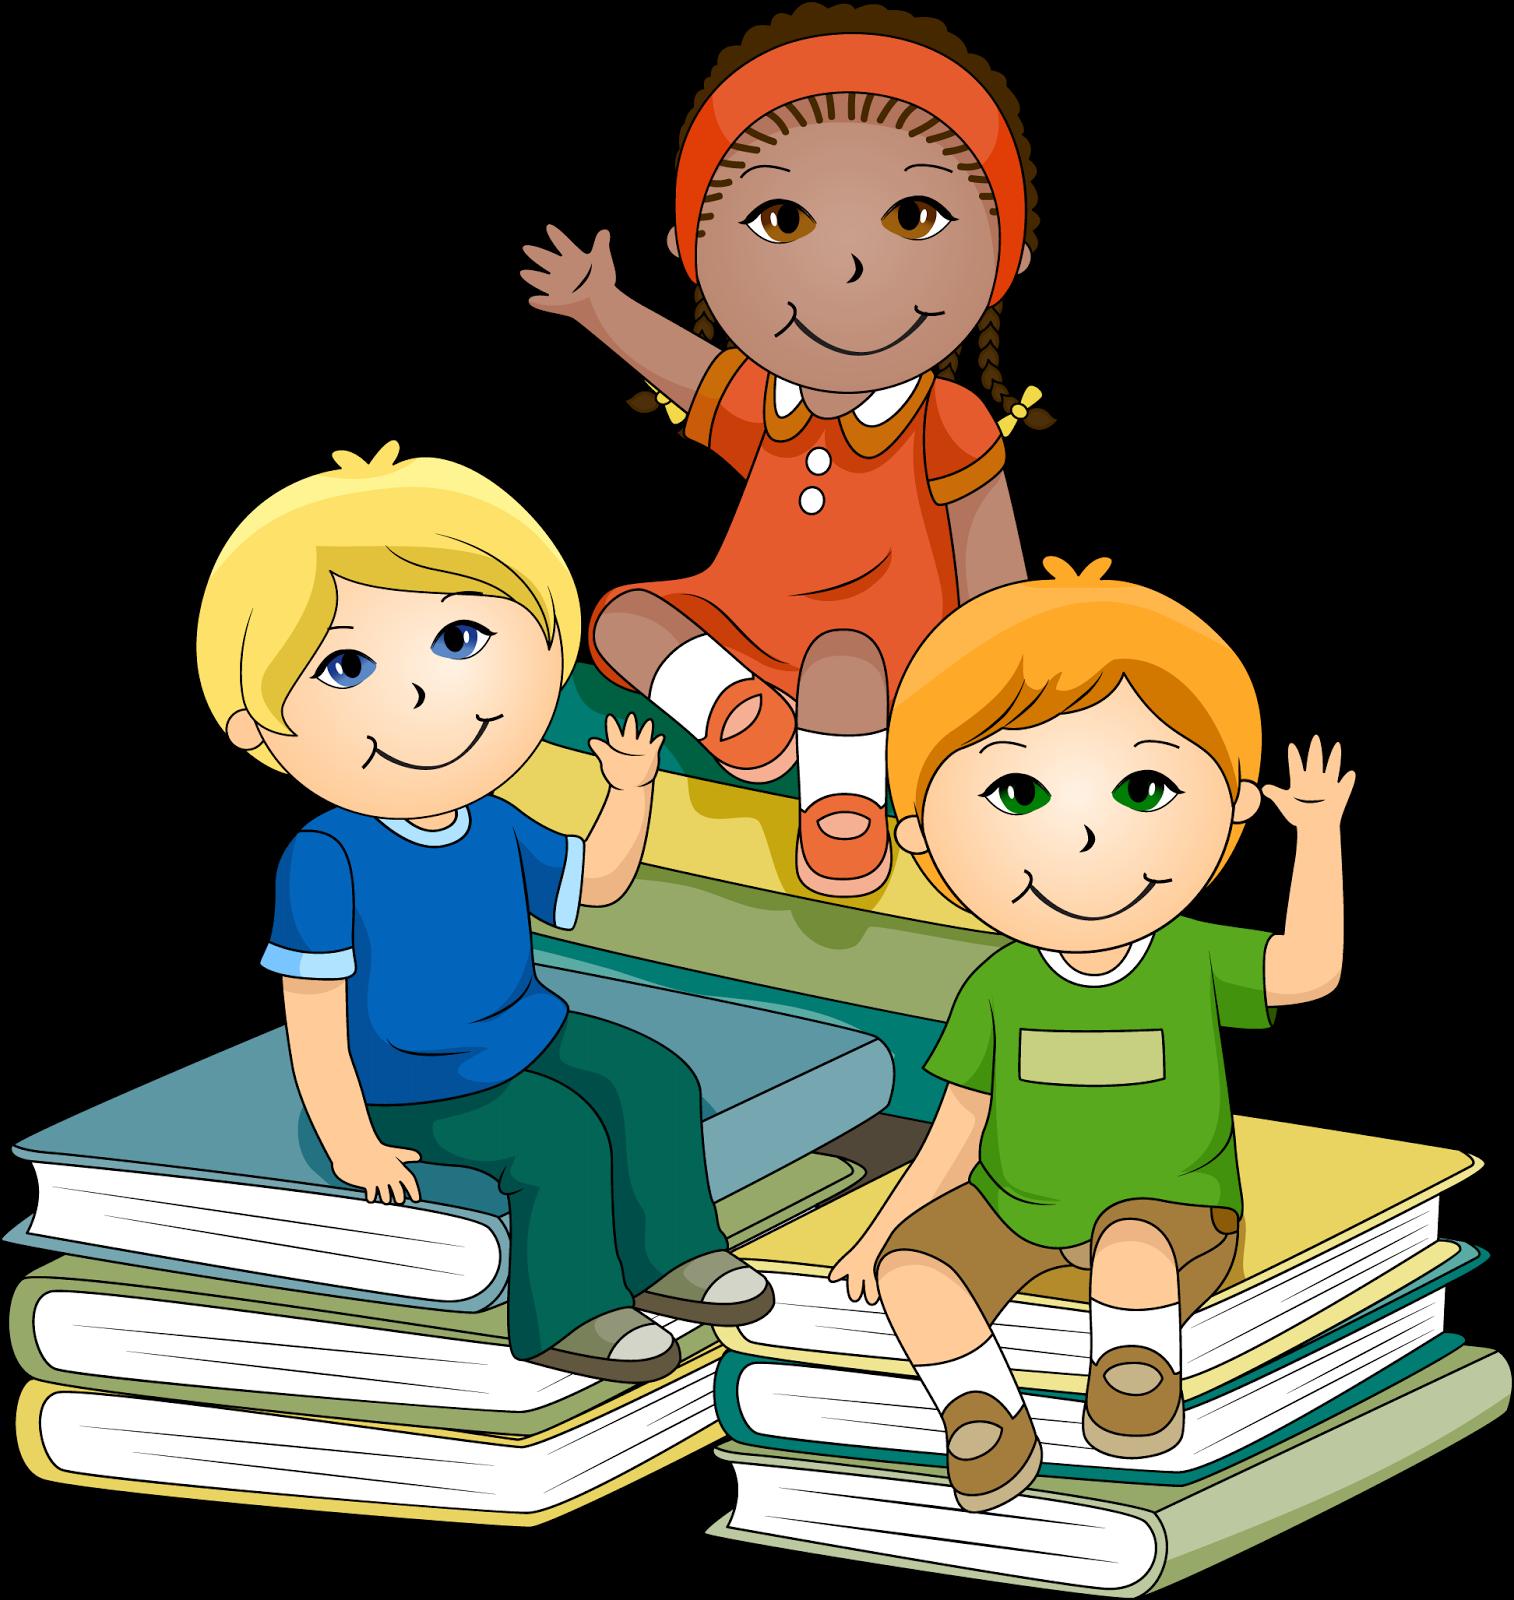 Chhildren reading books clipart banner royalty free download Free Children Reading Books Images, Download Free Clip Art, Free ... banner royalty free download